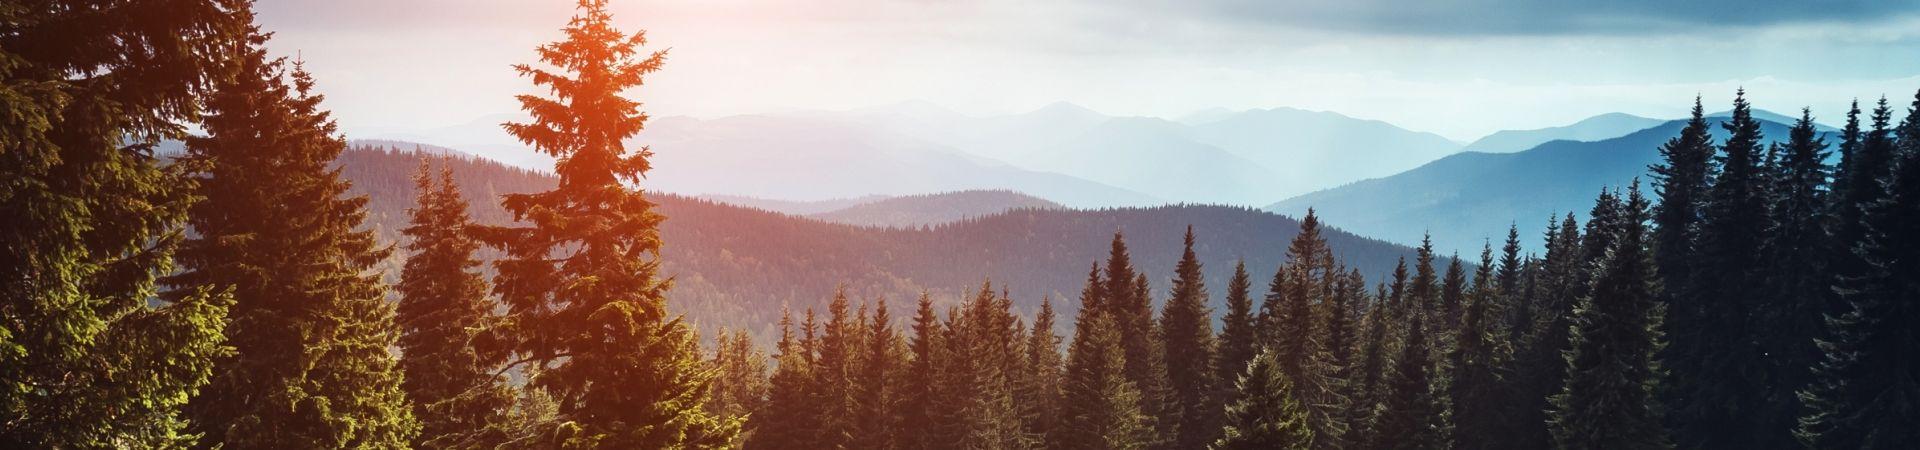 Mountain woodland slider